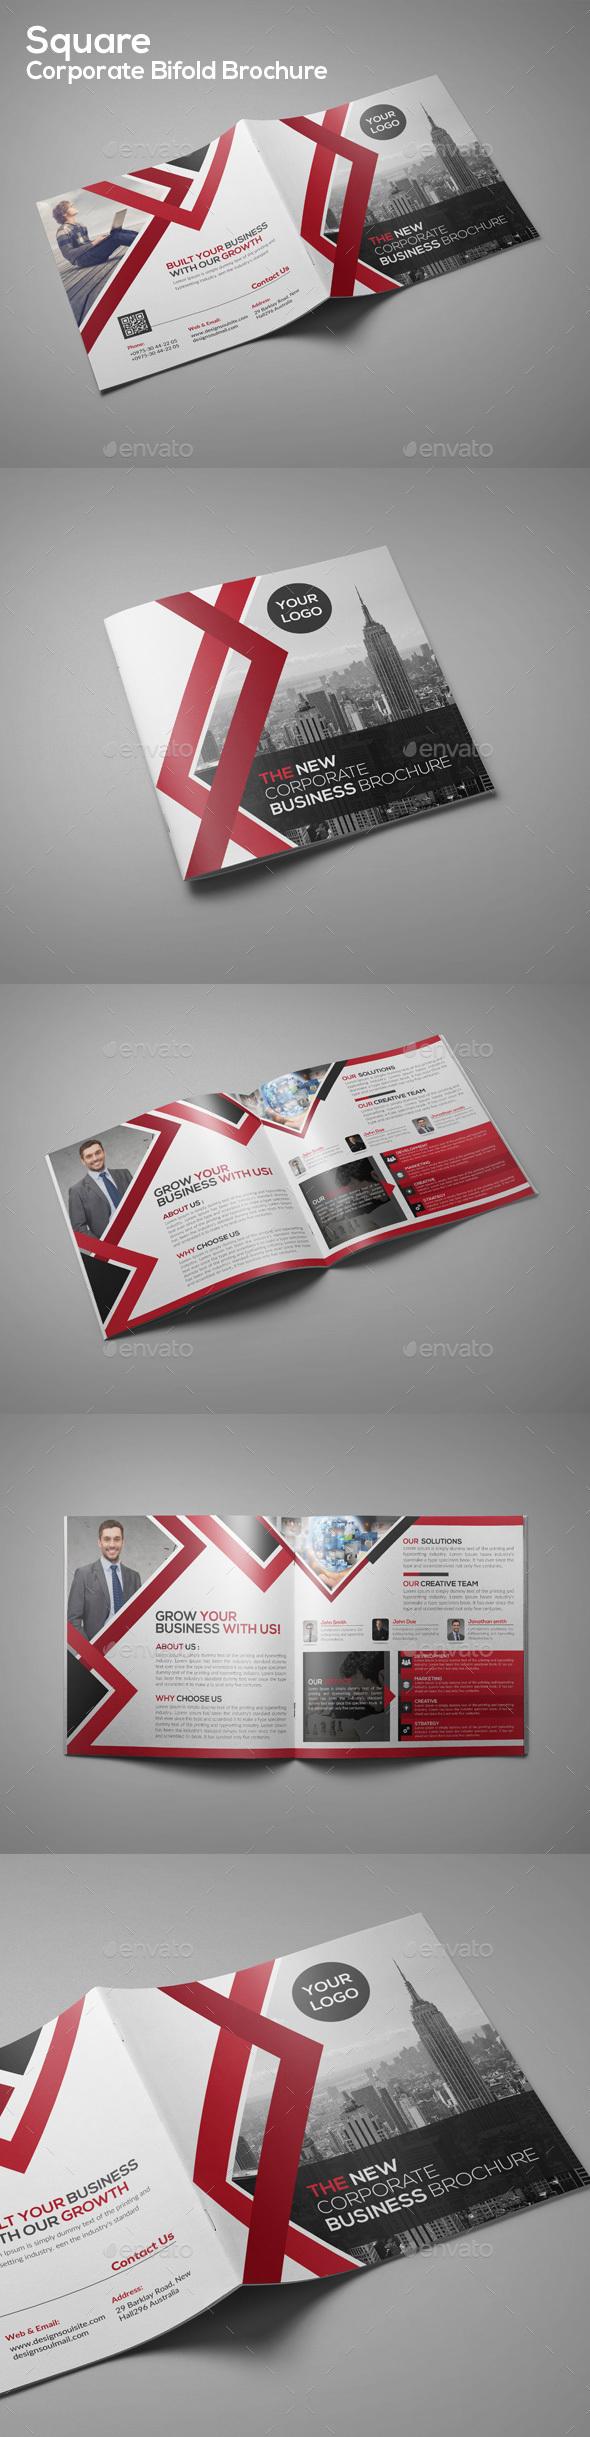 Square Corporate Bifold Brochure - Corporate Brochures